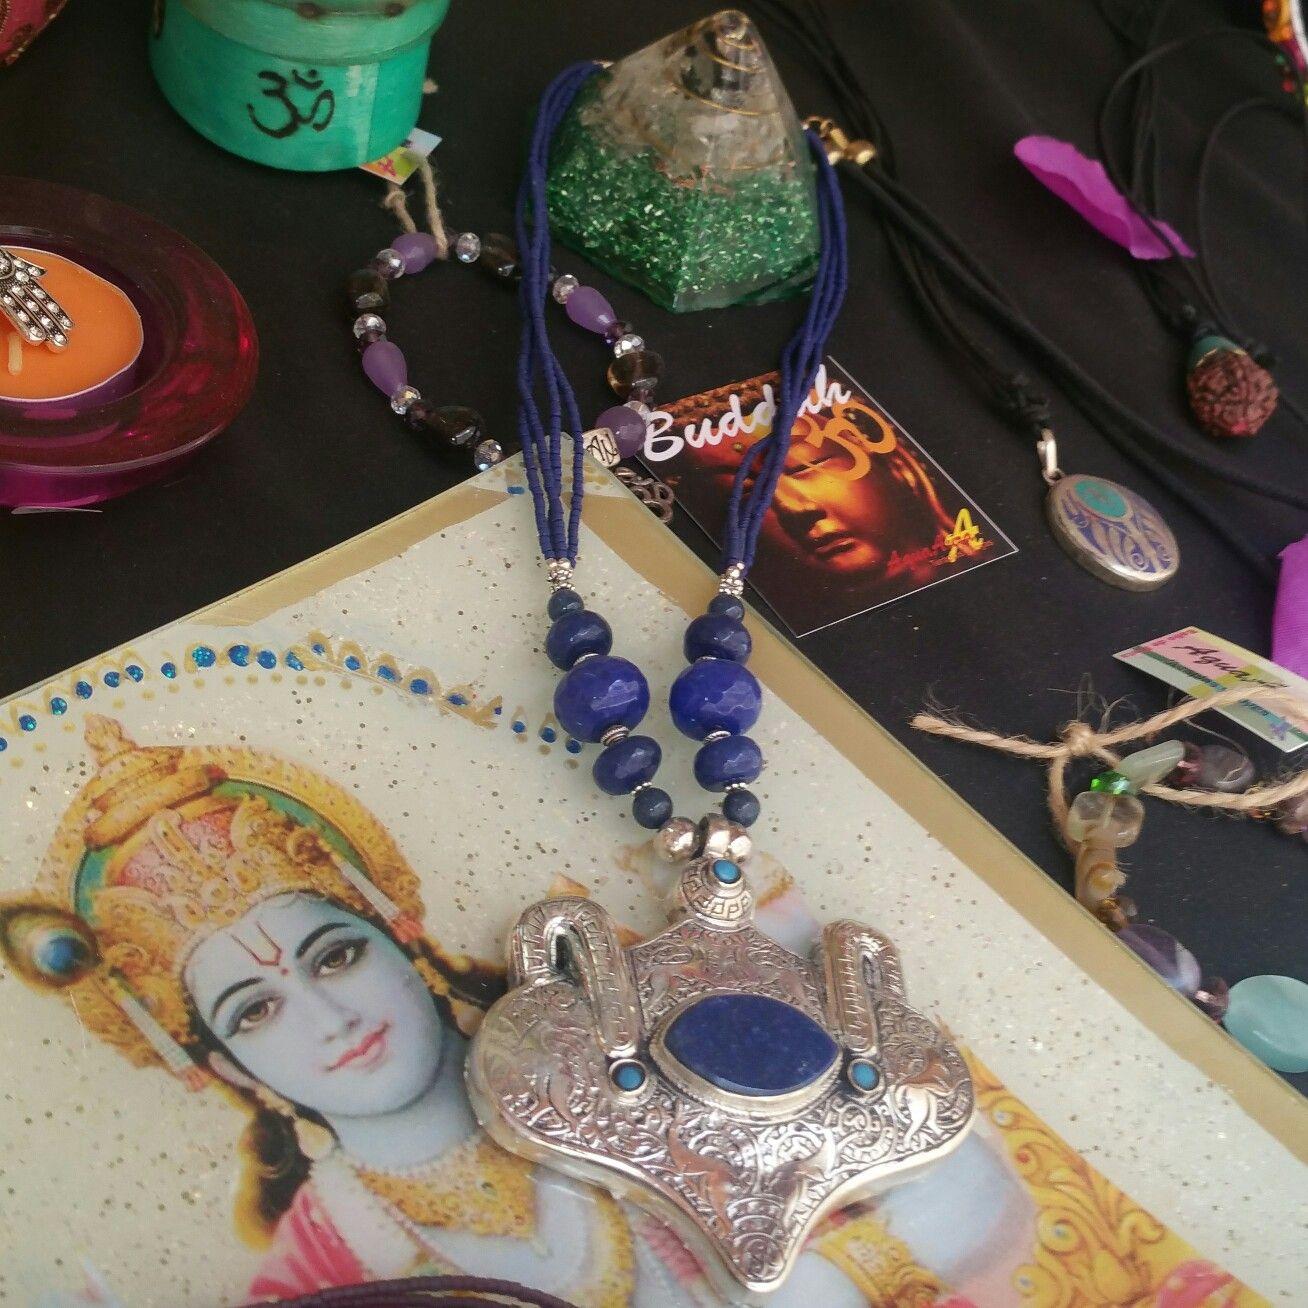 #AquaAura #Elche #Artesania #India #Buddah #mineral #orgonite #religion #regalo #gift